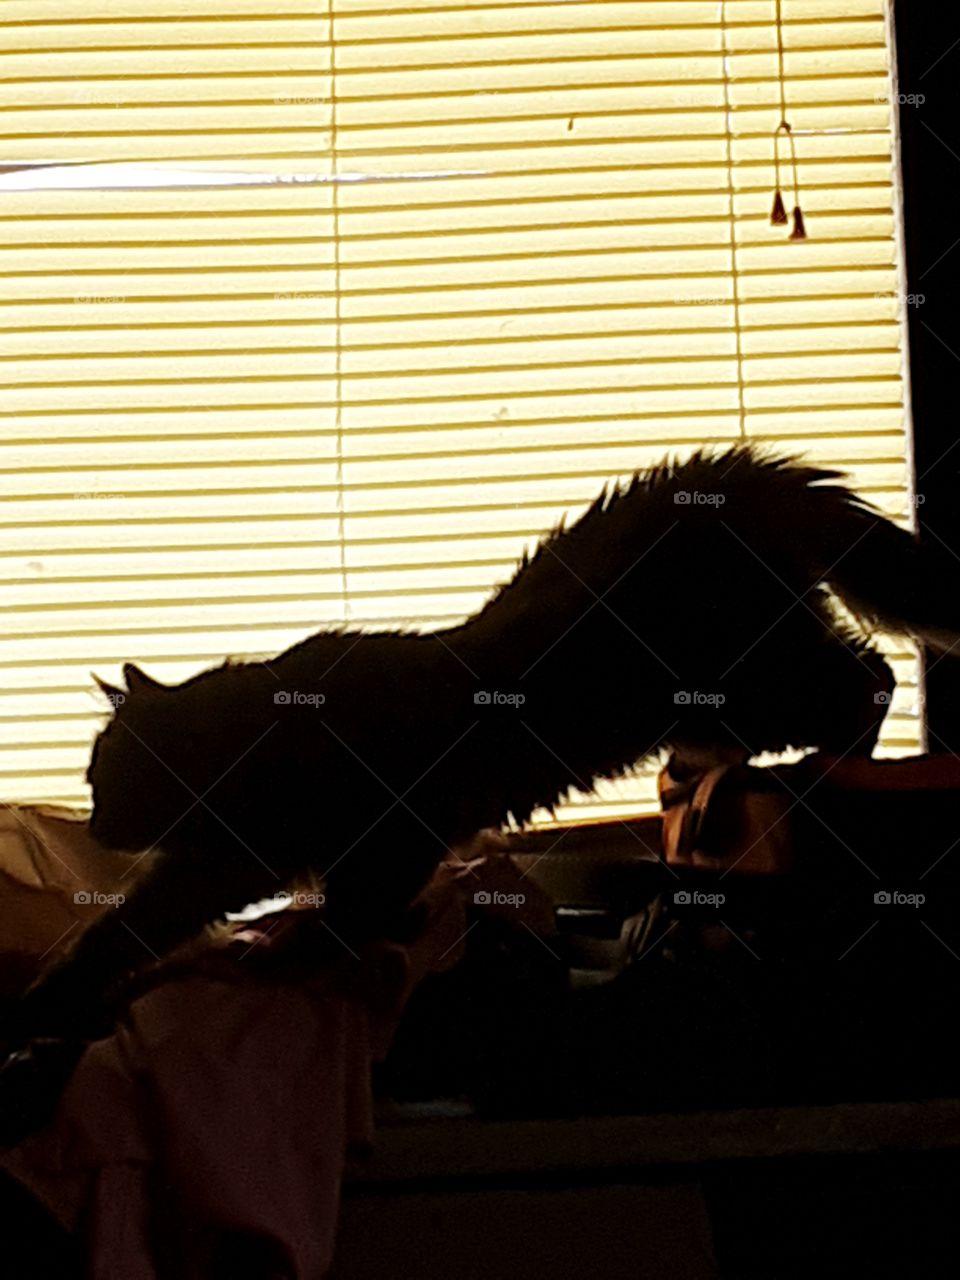 A cat stalking a stinkbug.